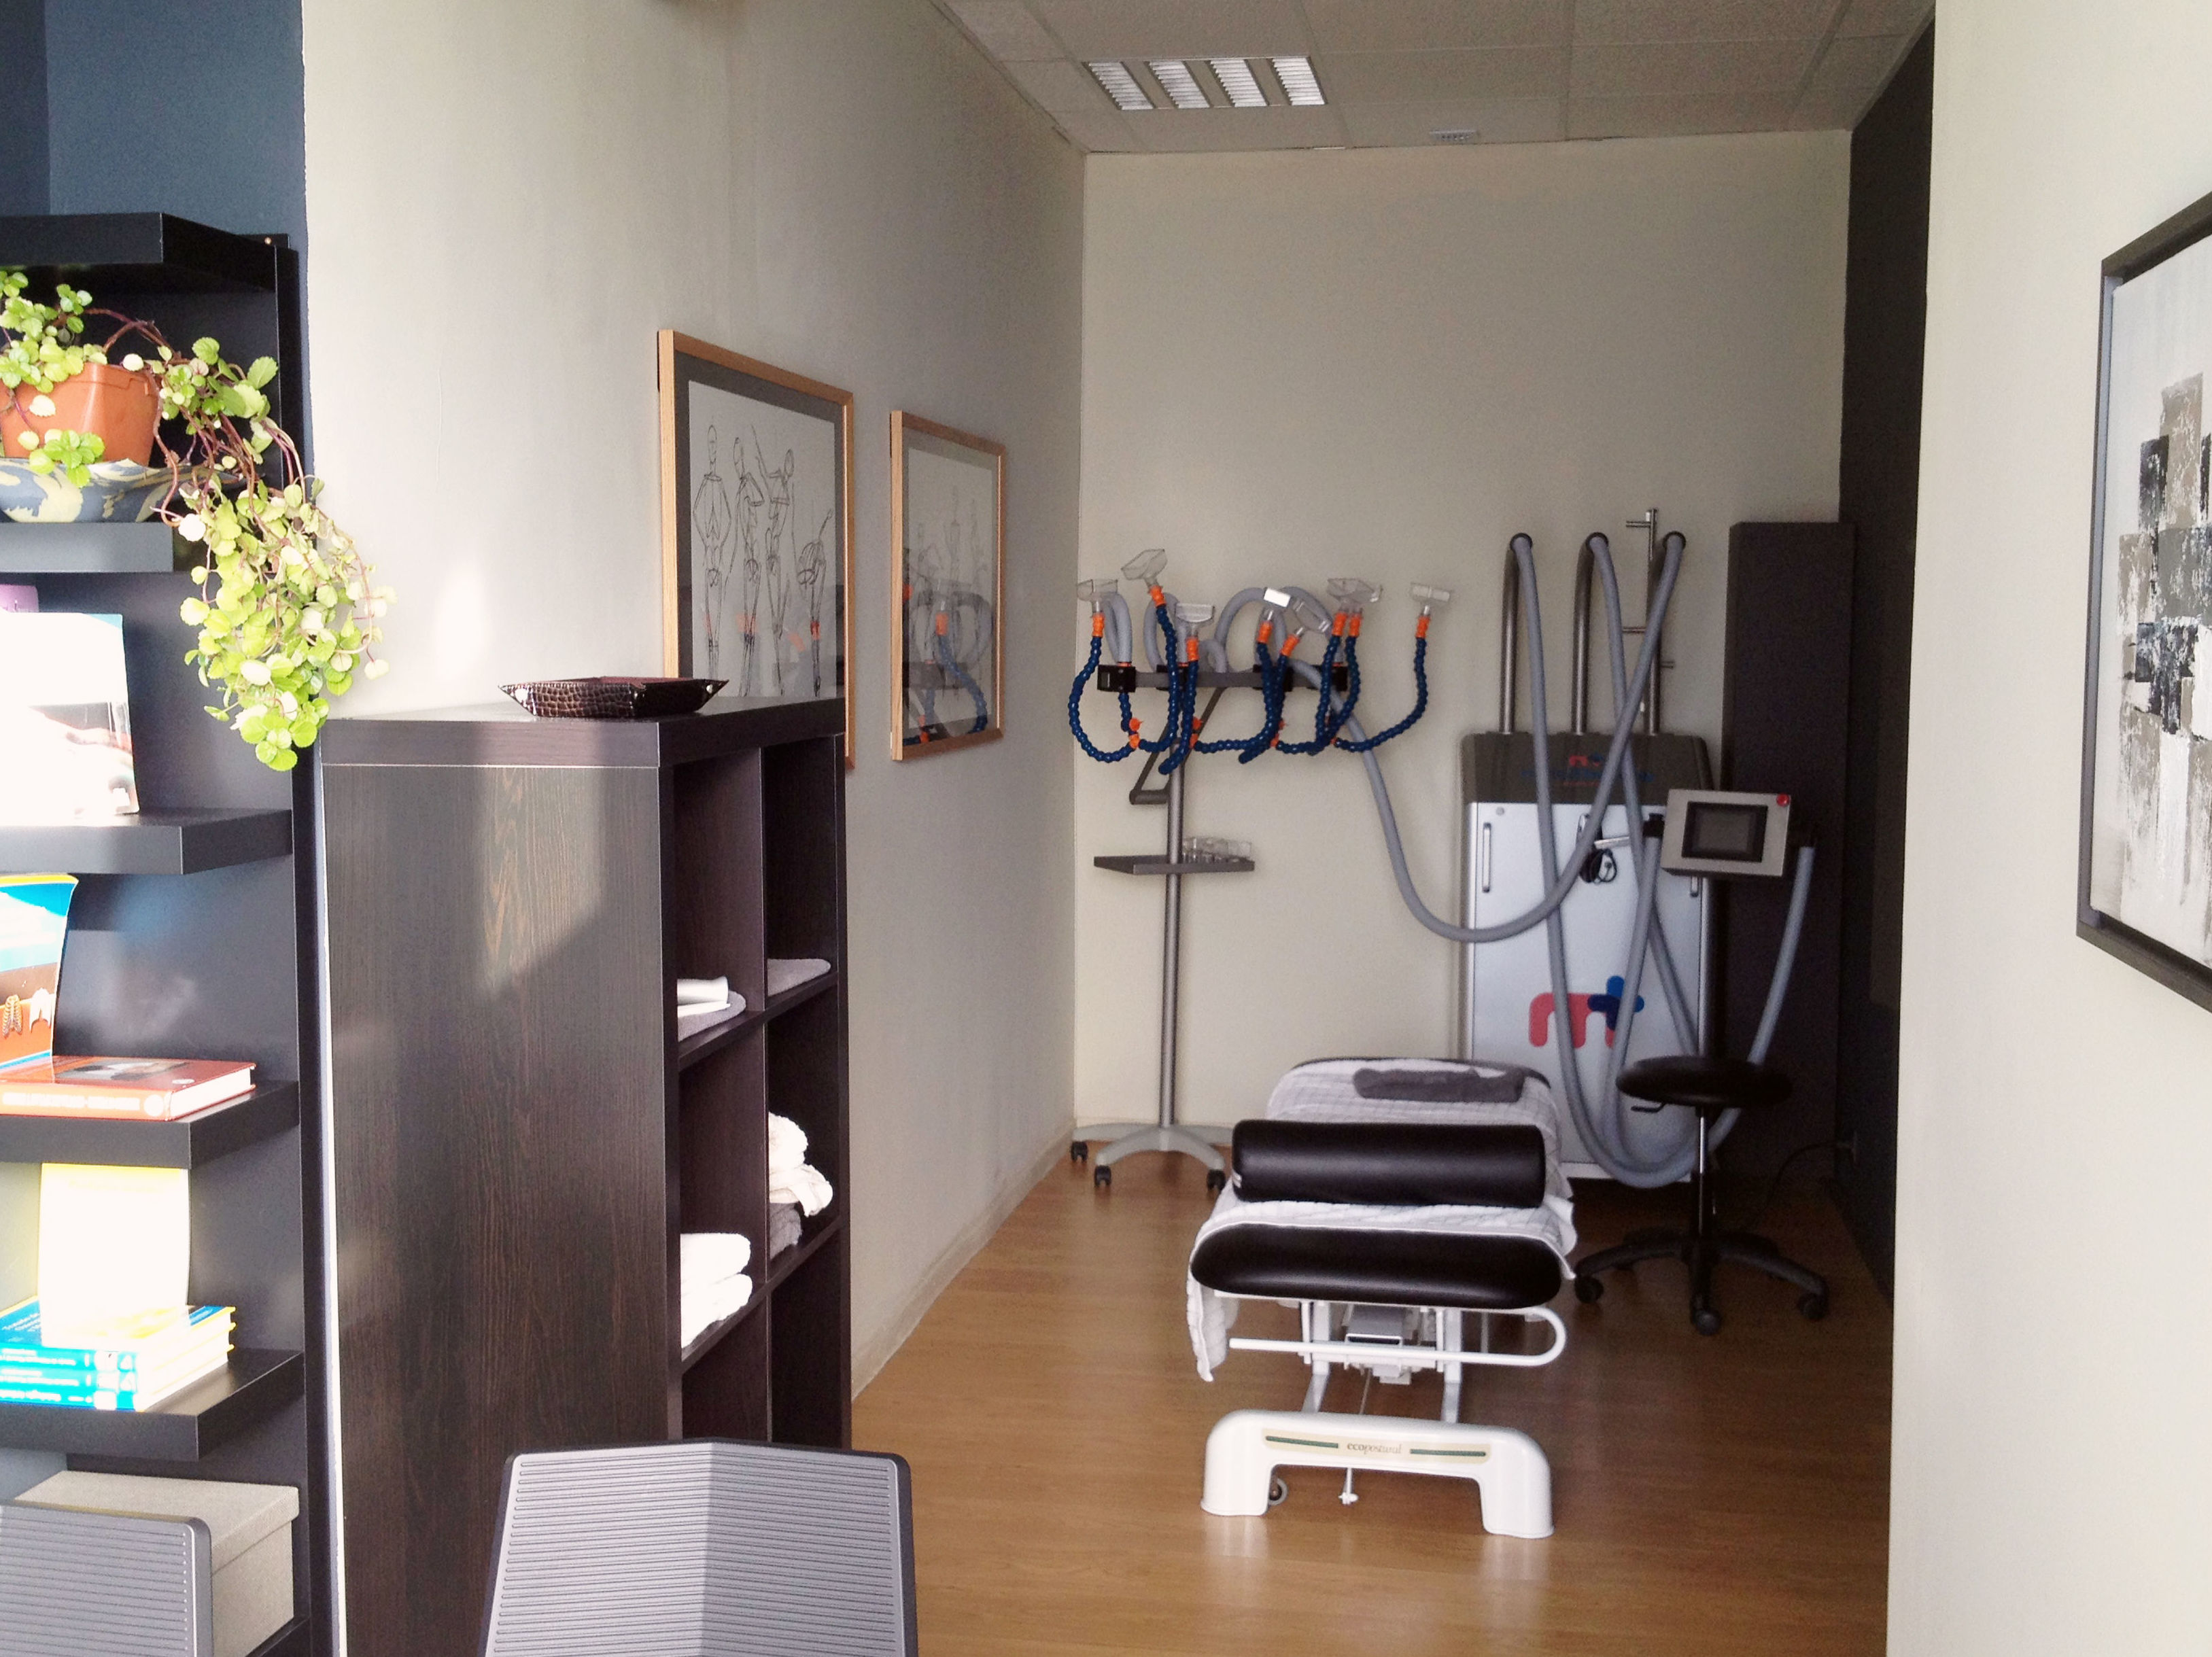 Centro de fisioterapia en Matiena, Abadiño